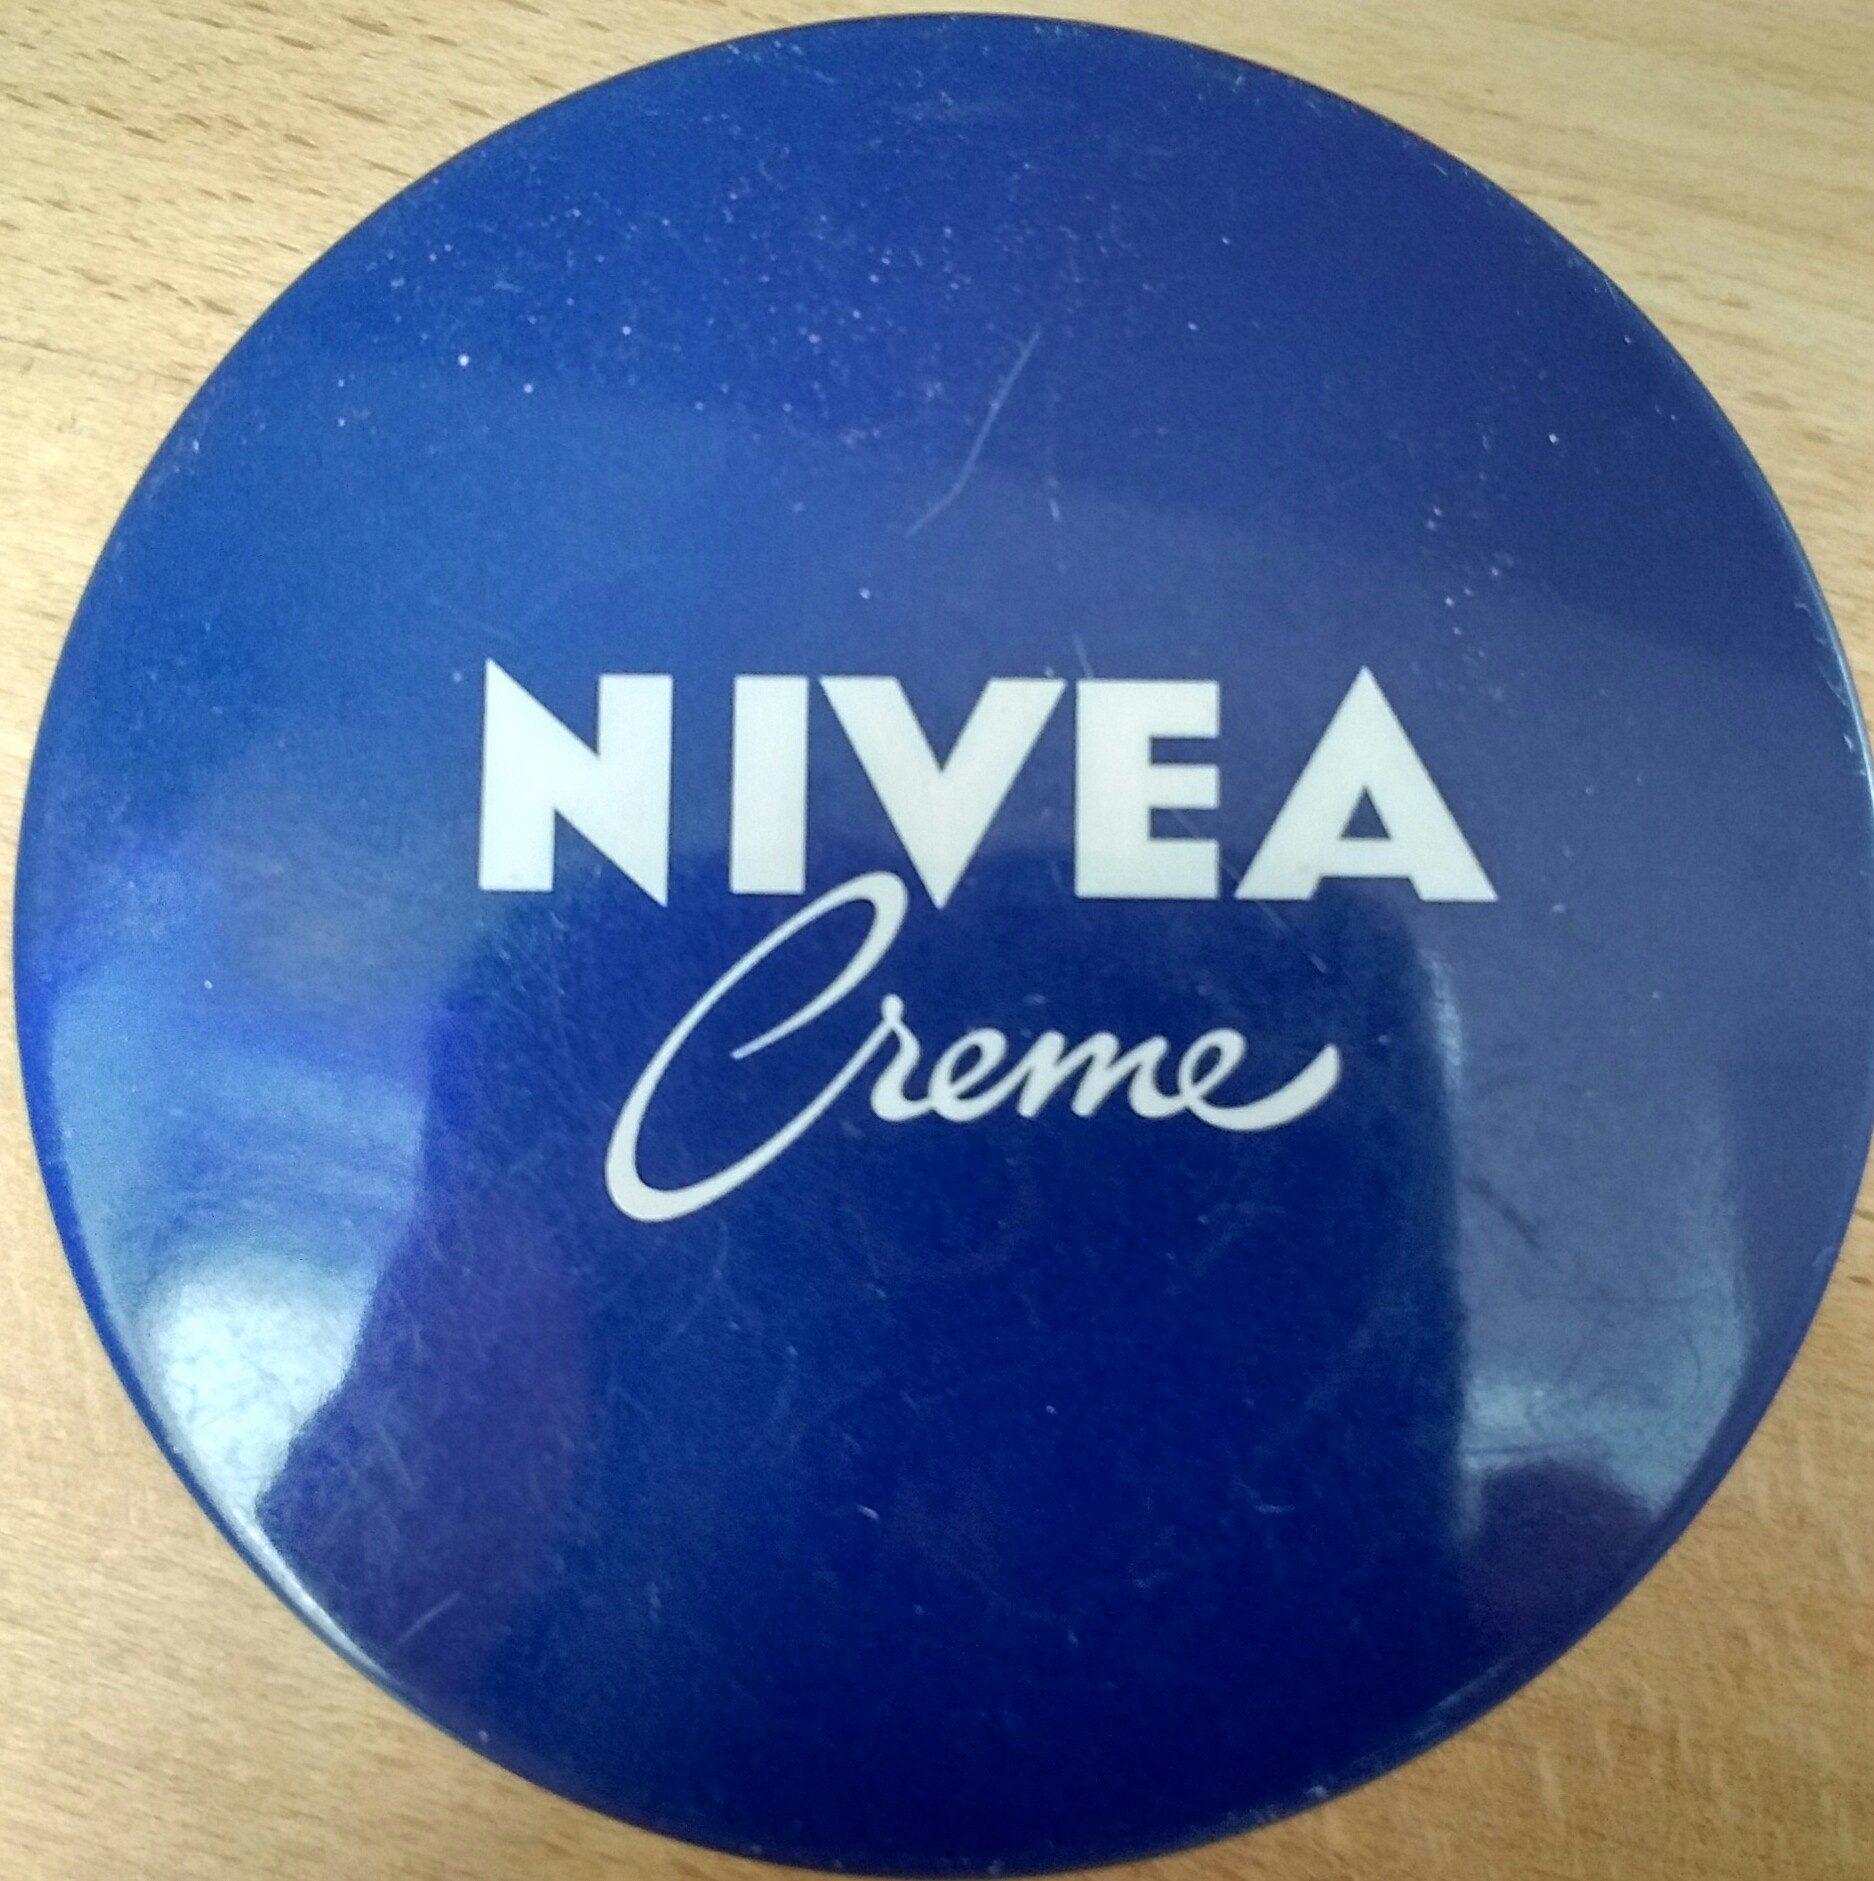 Nivea Creme - Product - de